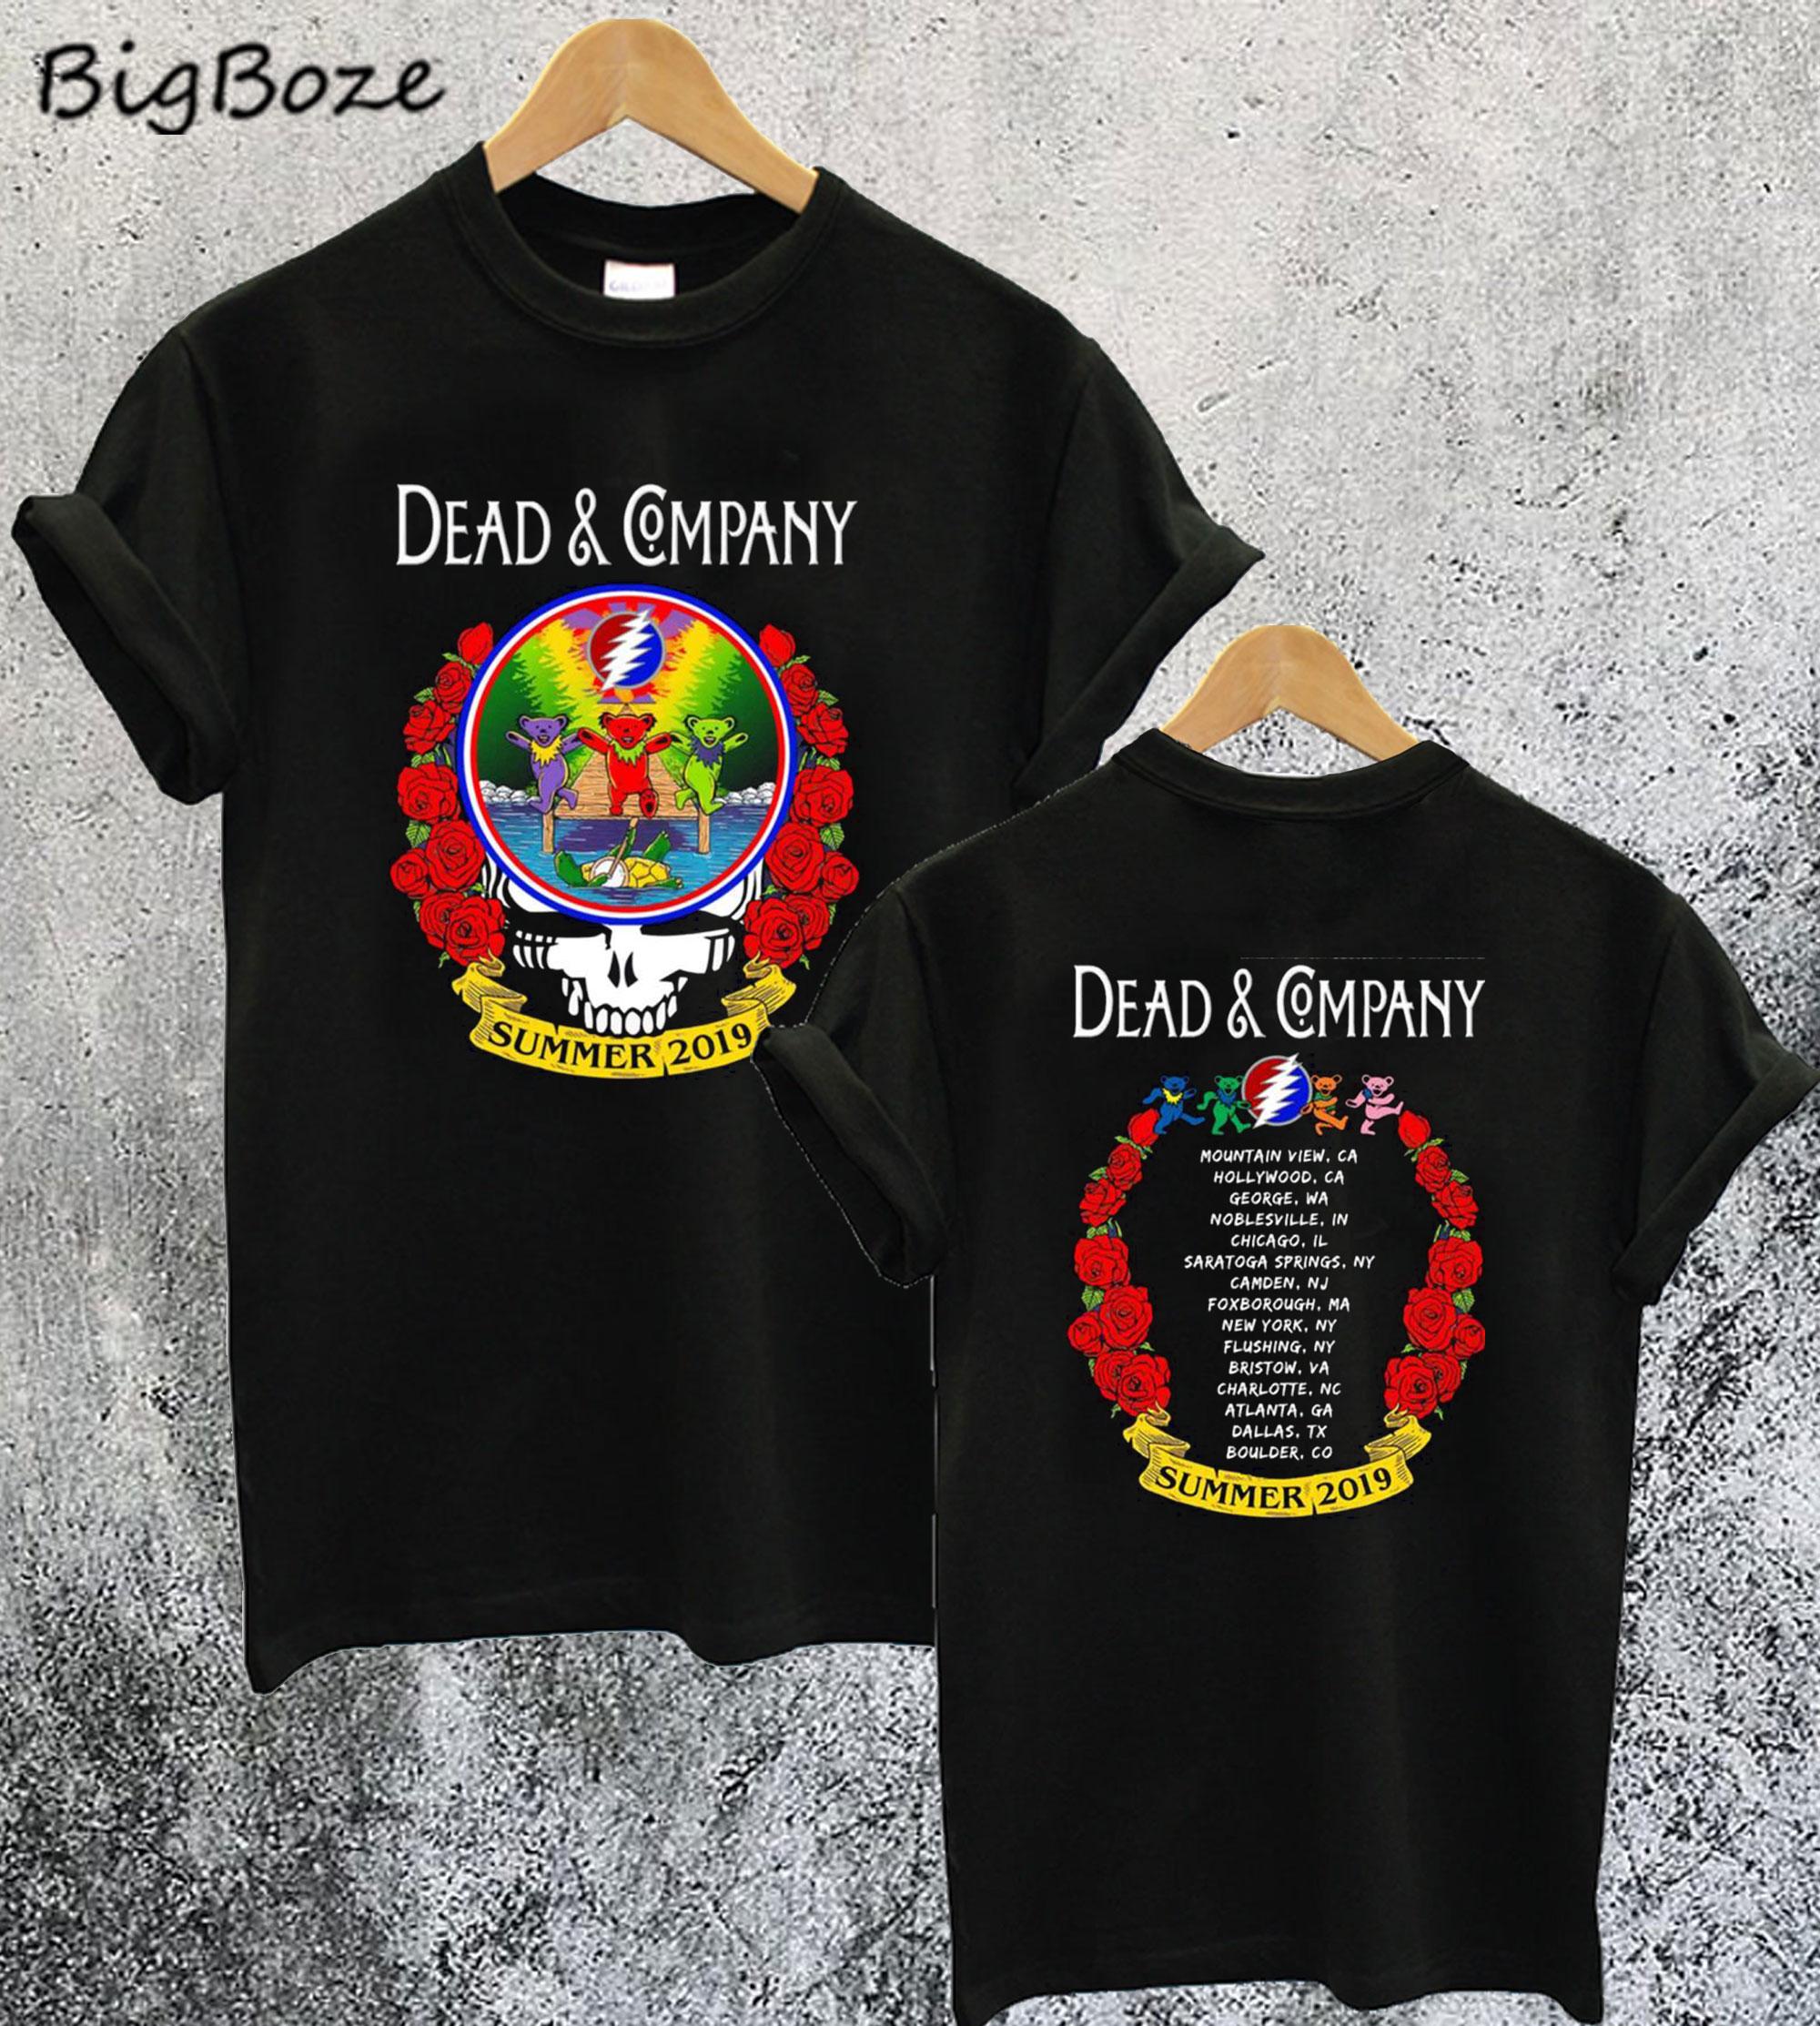 Dead & Company Summer Tour 2019 T-Shirt